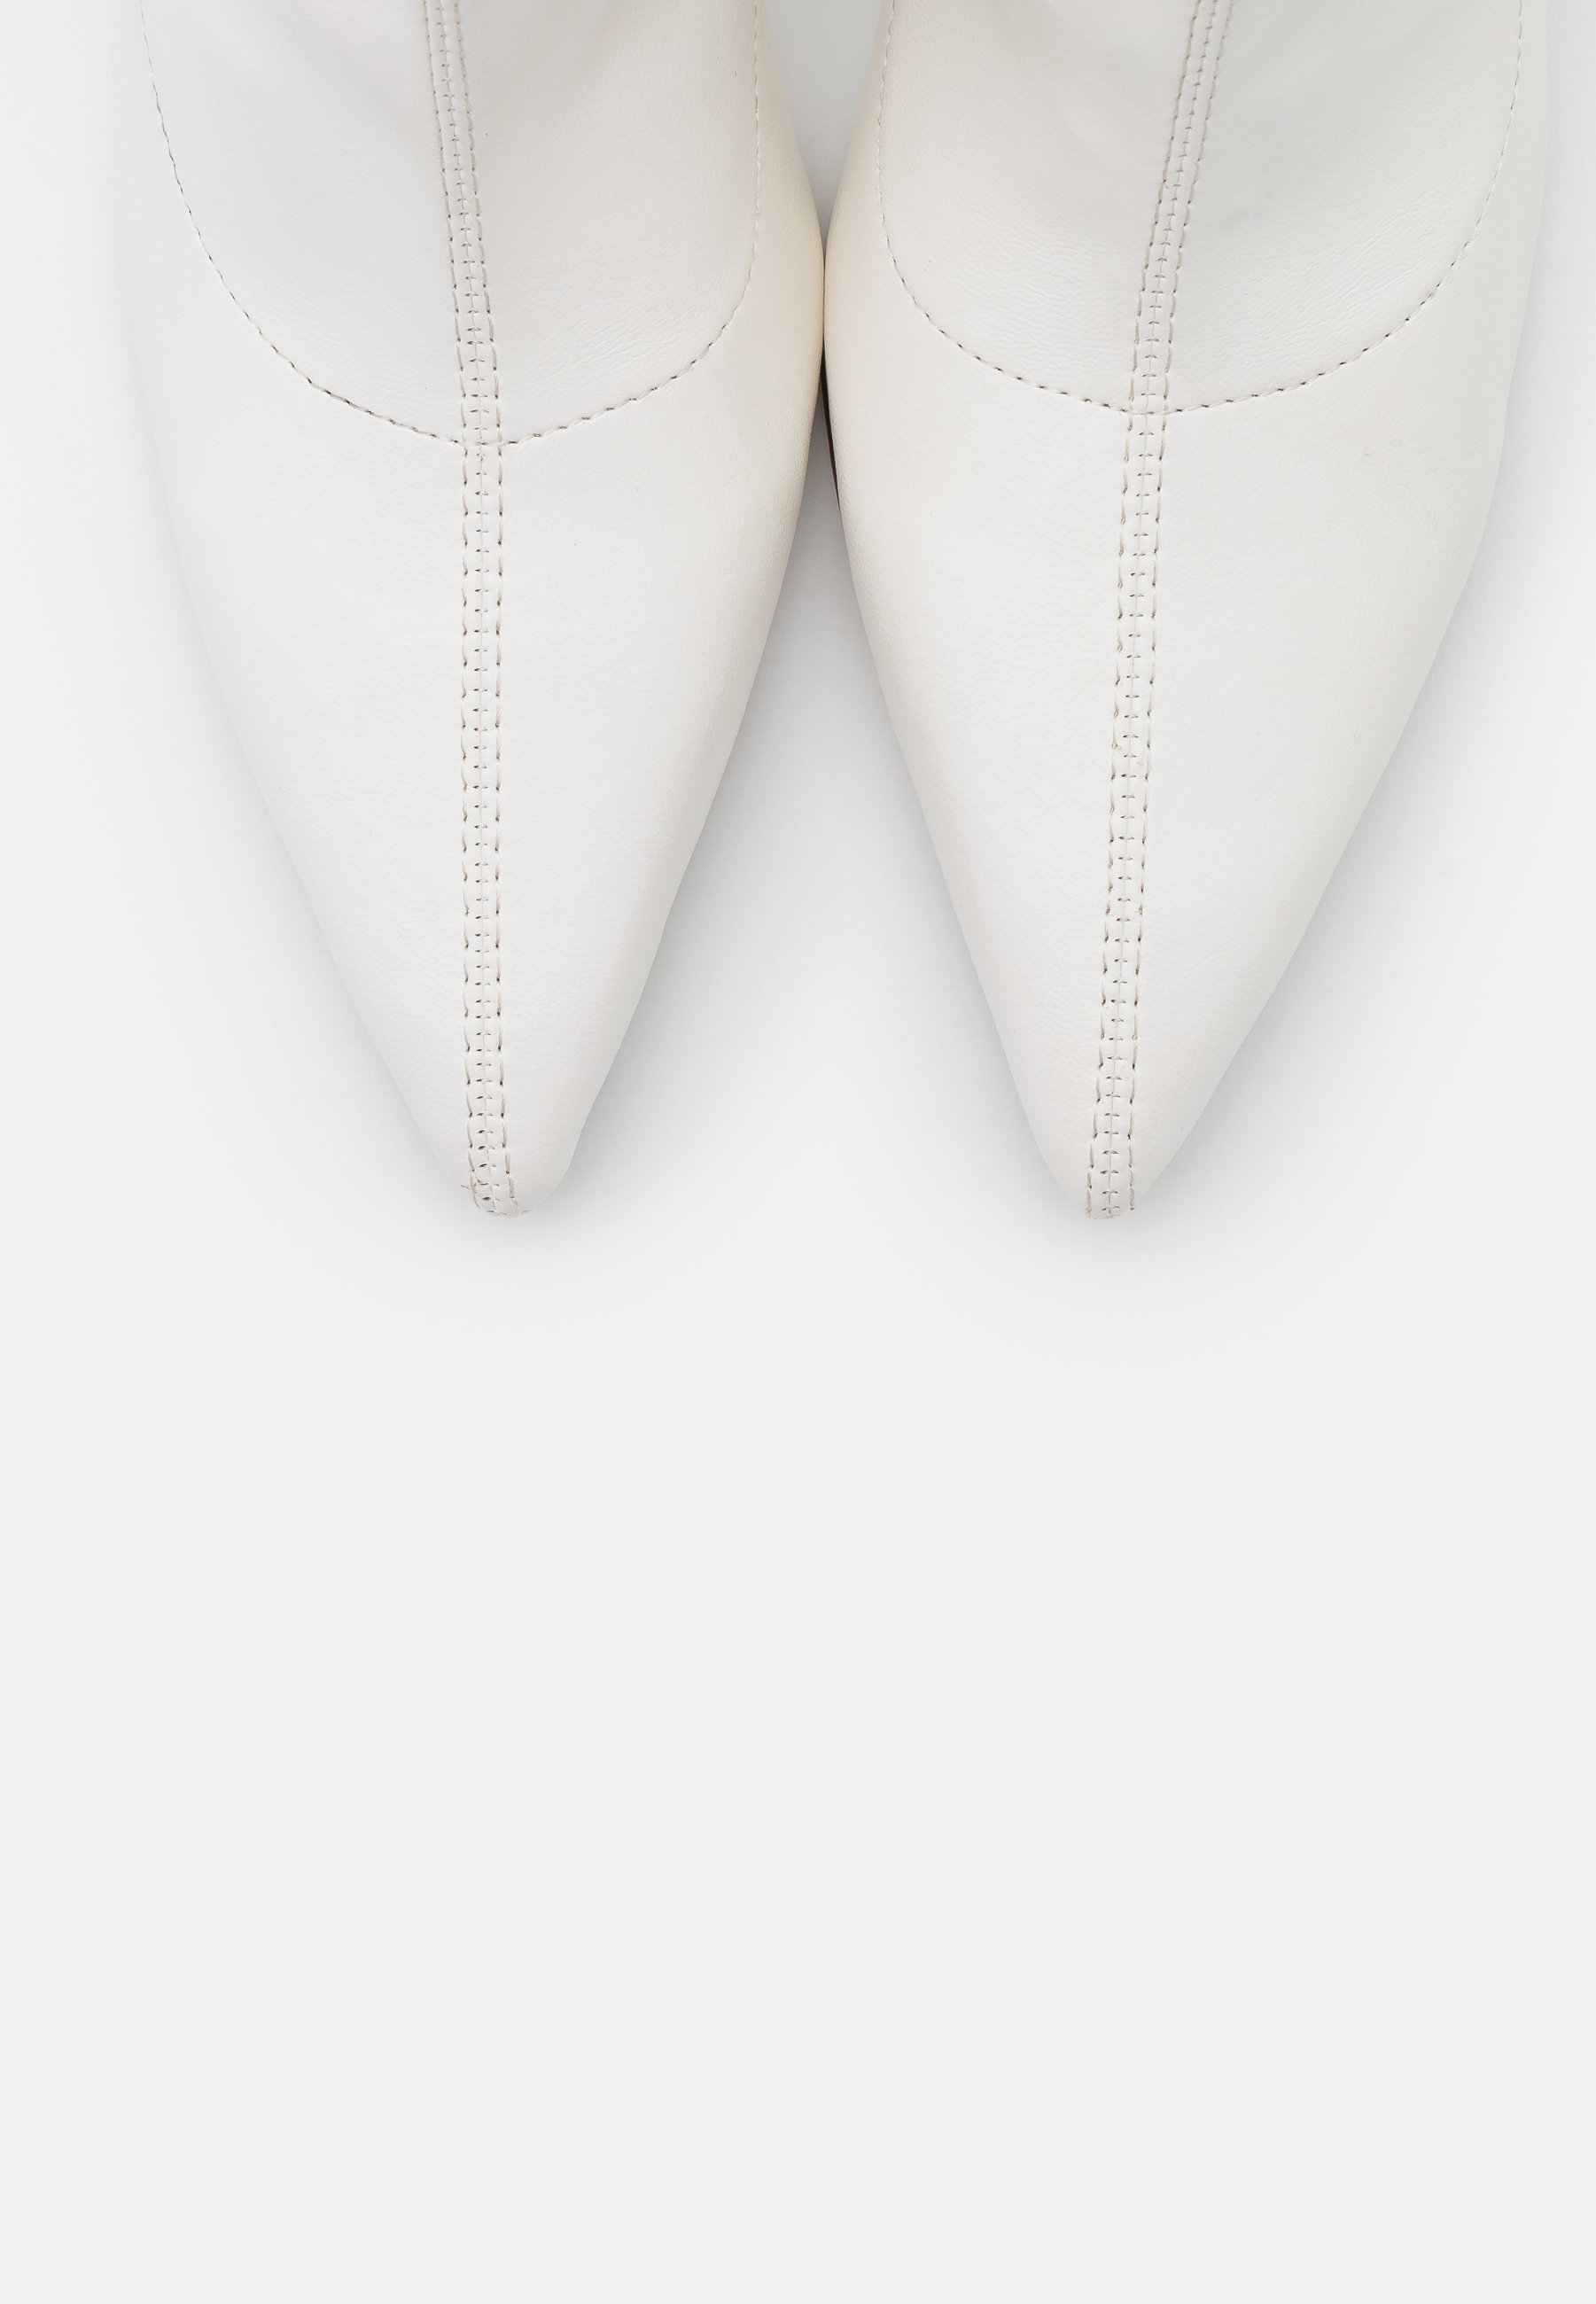 BEBO STECY - Bottines à talons hauts - white vKOA7sWL